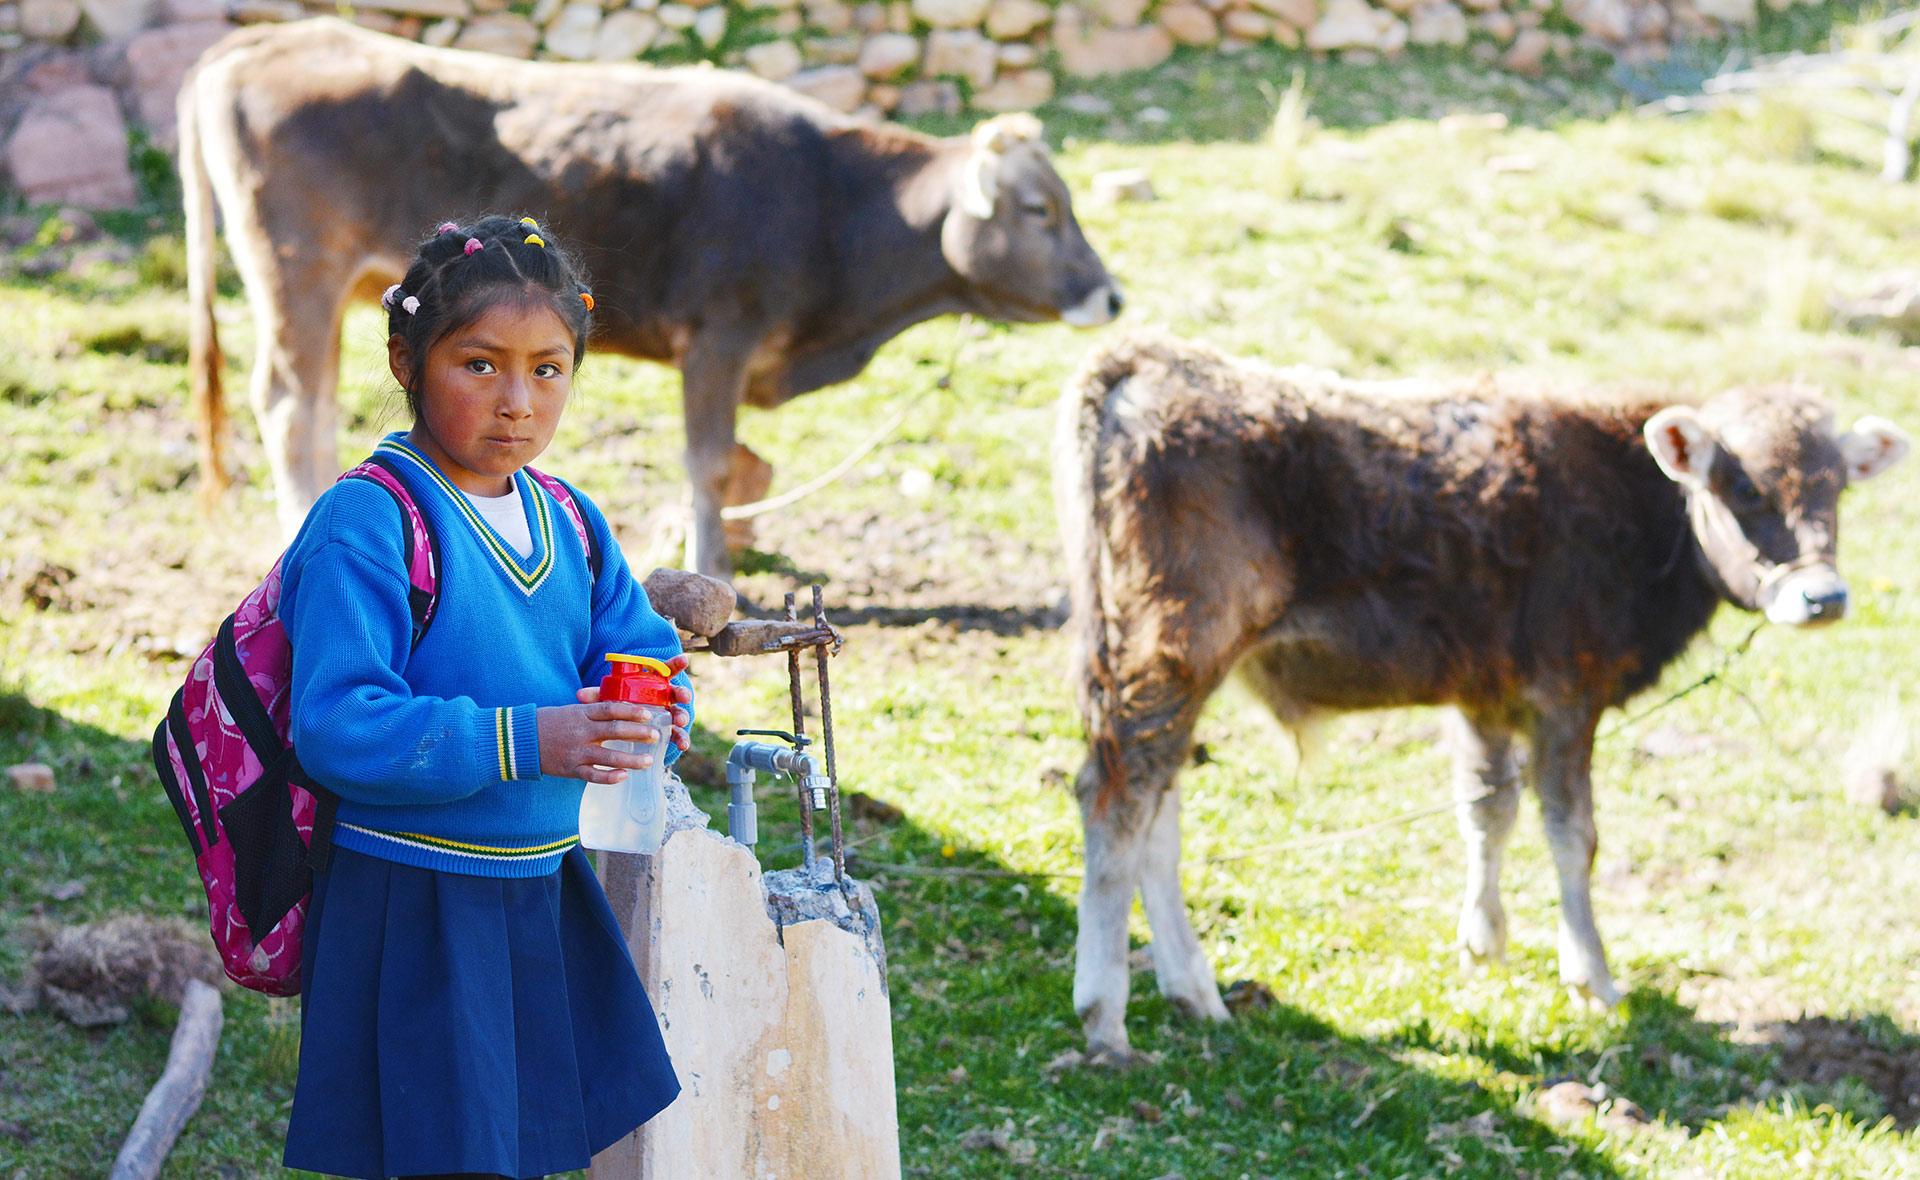 BBVA-Podcast-Yachay-profe-niña-vaca-ganaderia-educacion